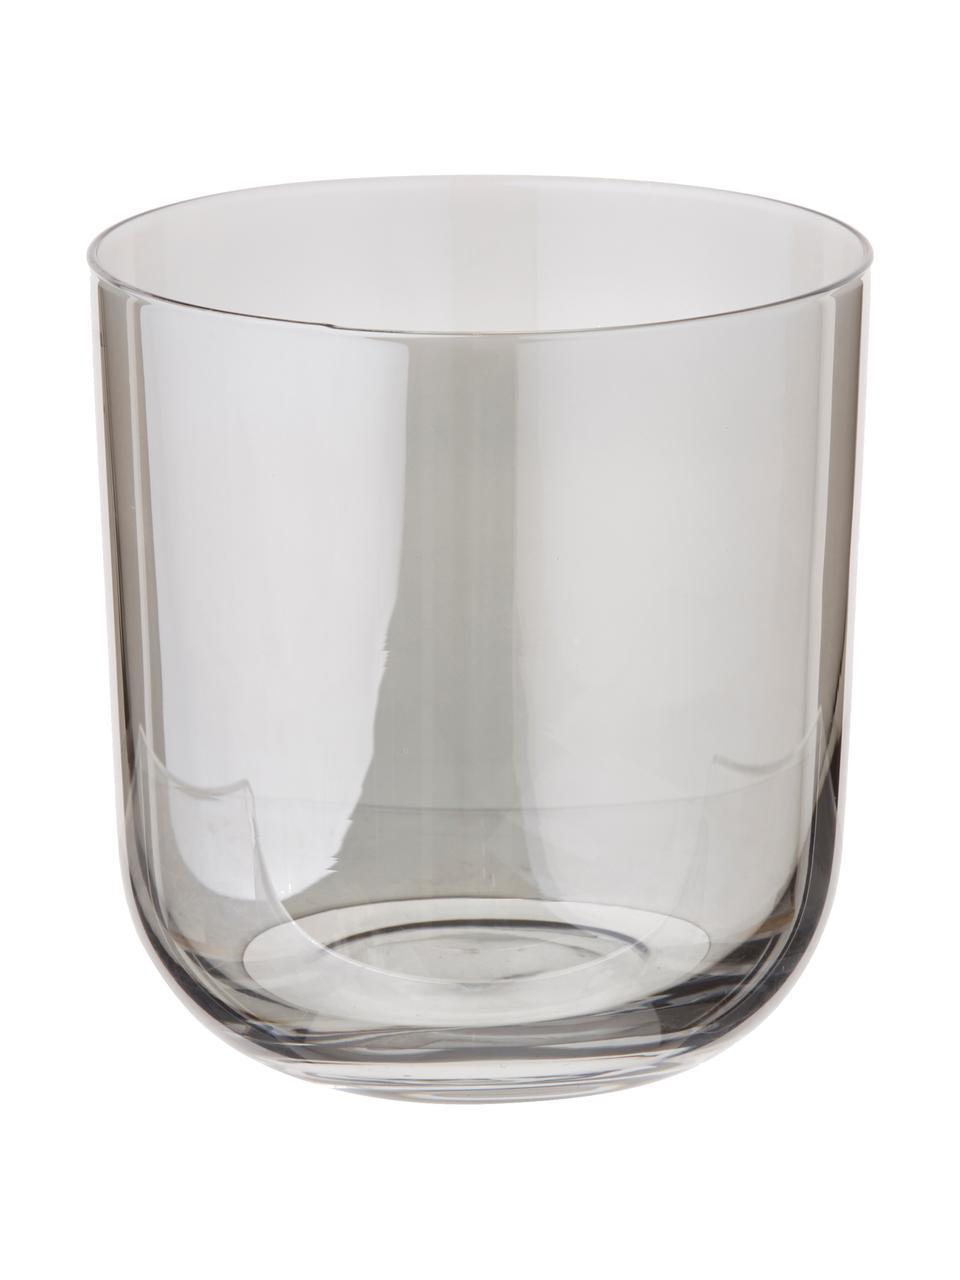 Set 4 bicchieri acqua dipinti a mano Polka, Vetro, Giallo, bordeaux, grigio, marrone, Ø 9 x Alt. 9 cm